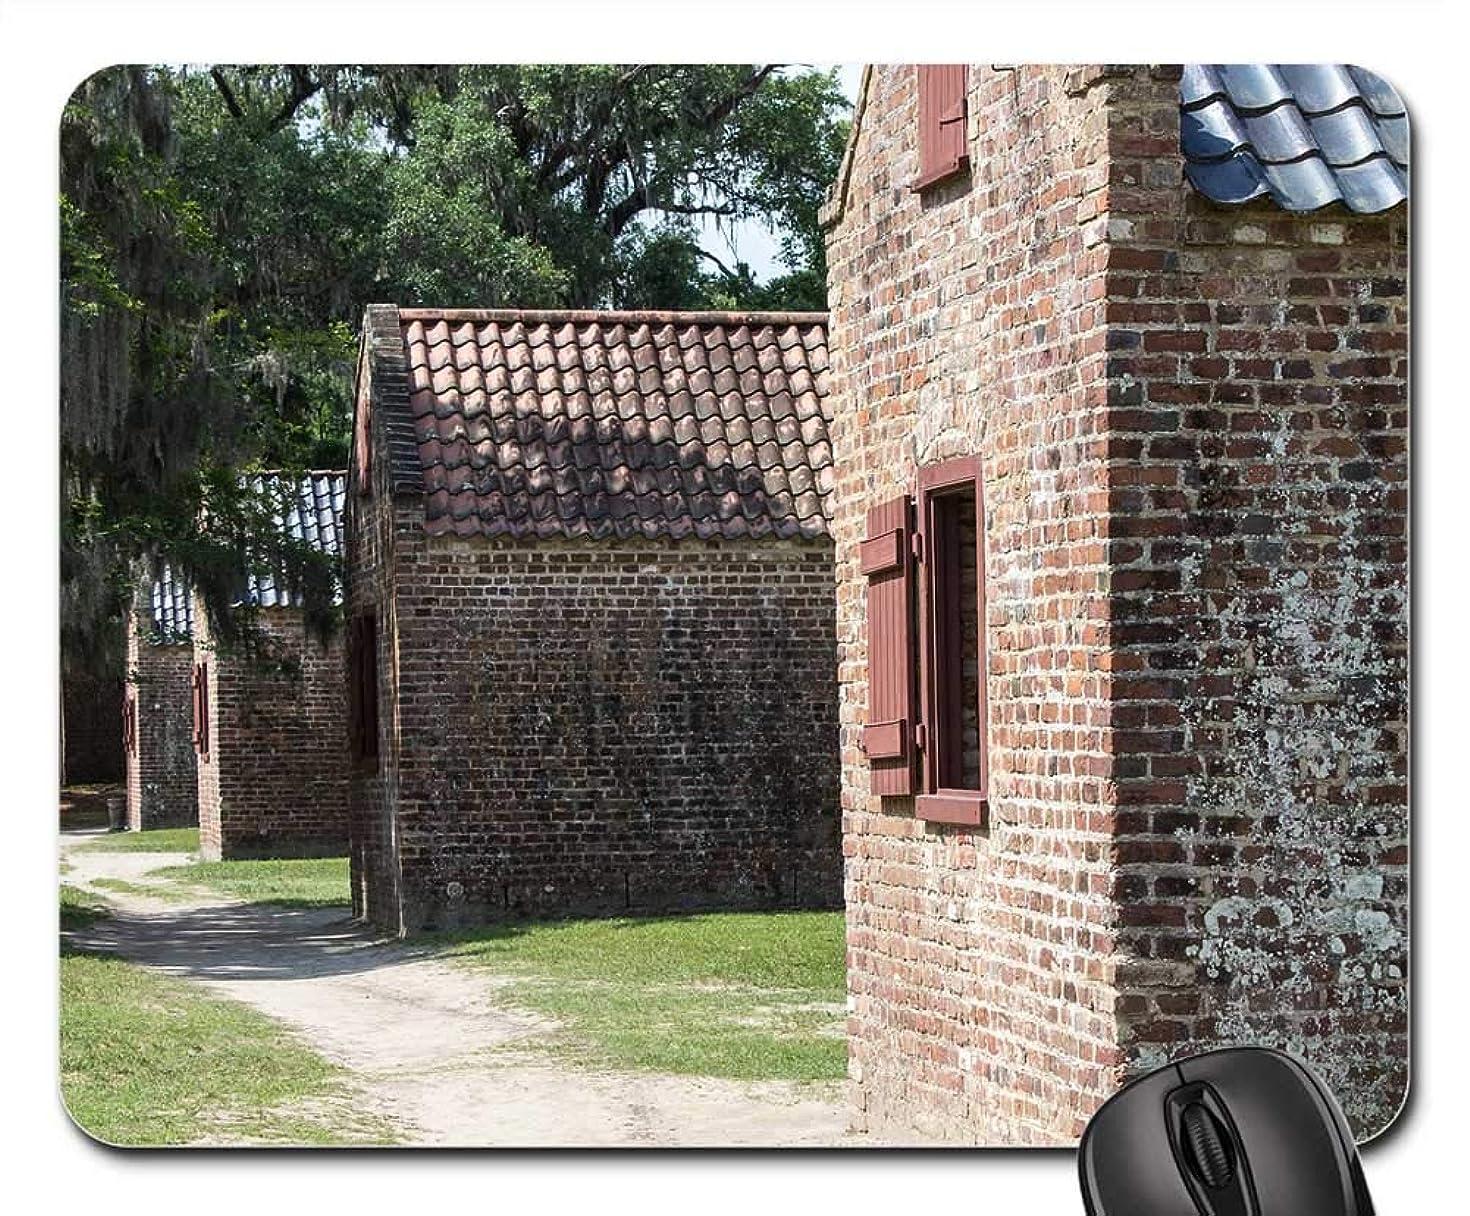 Mouse Pad - Slave Quarters Boone Plantation South Carolina